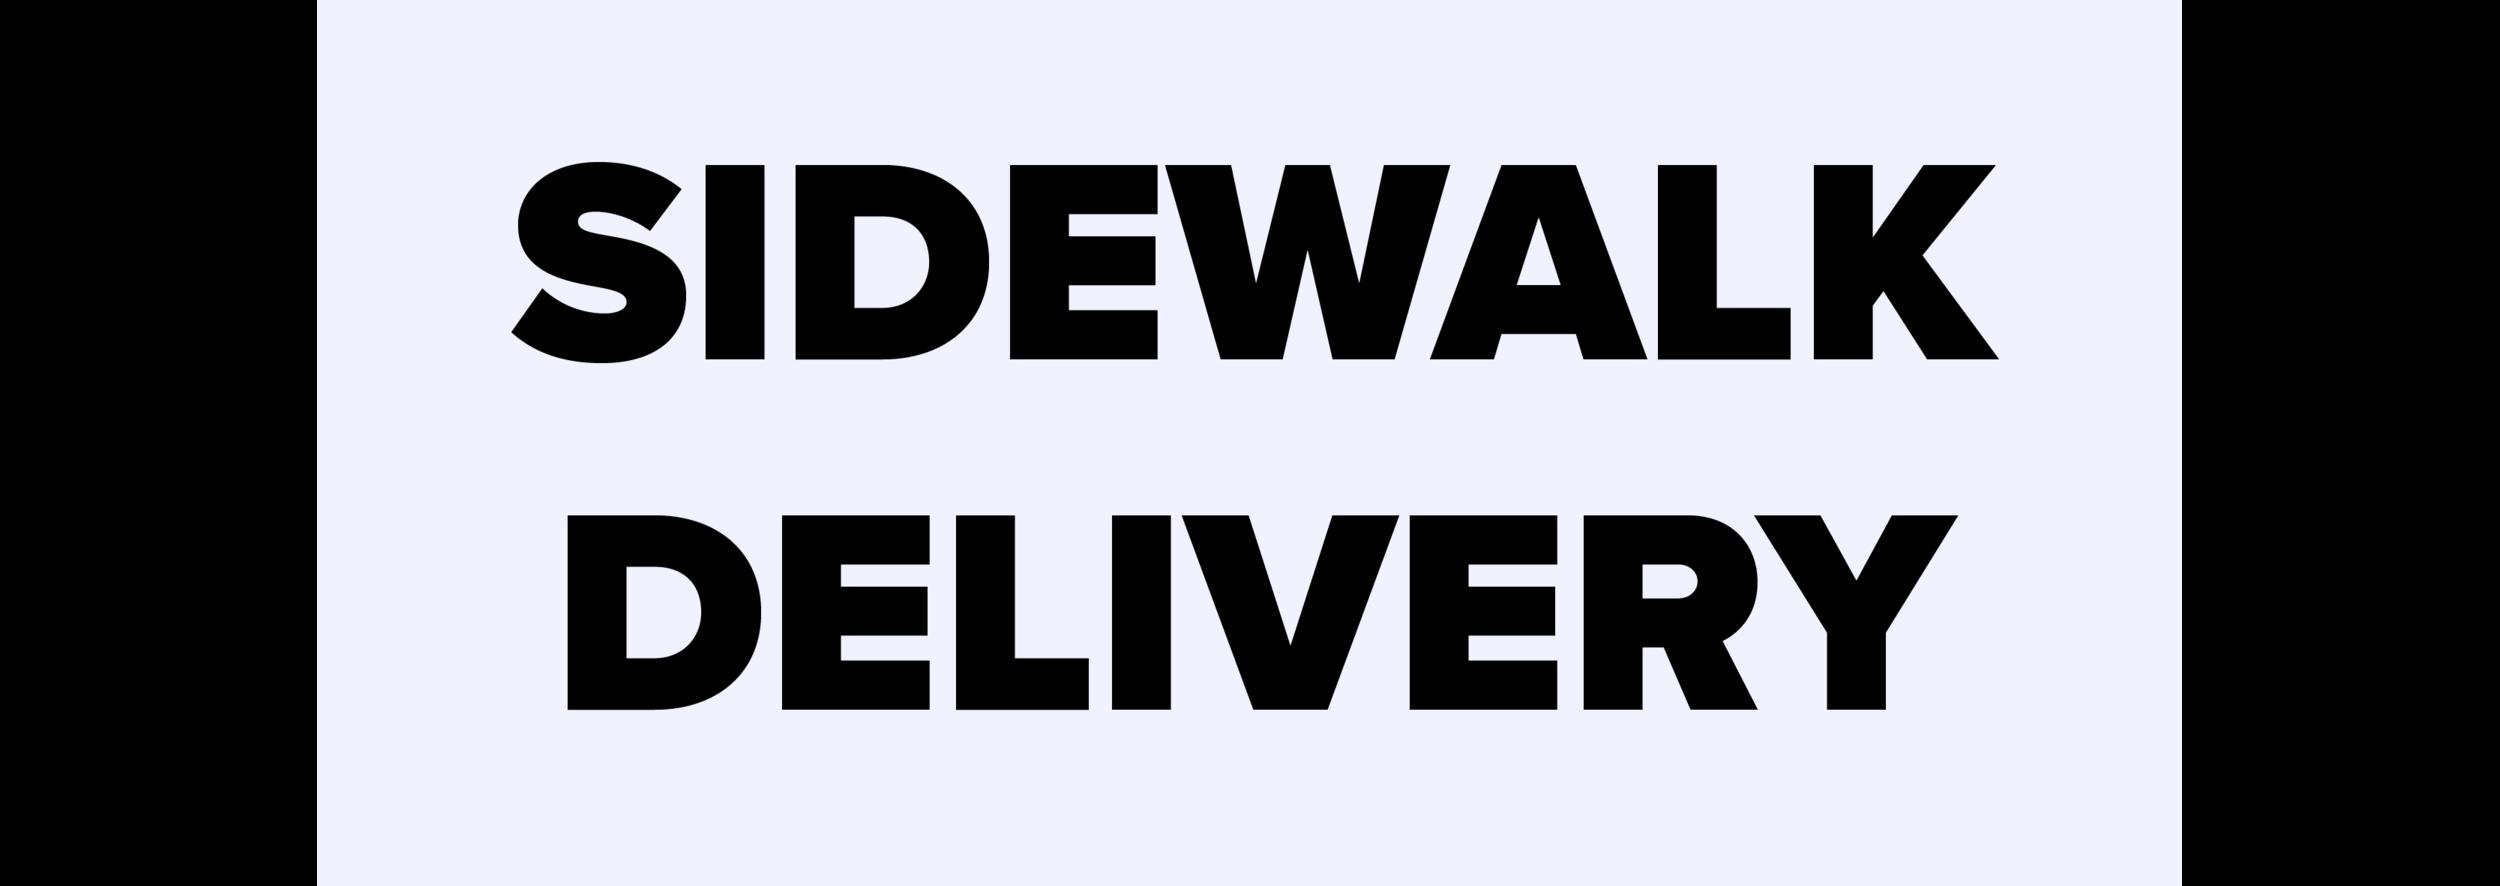 Sidewalk Delivery Title-01.png